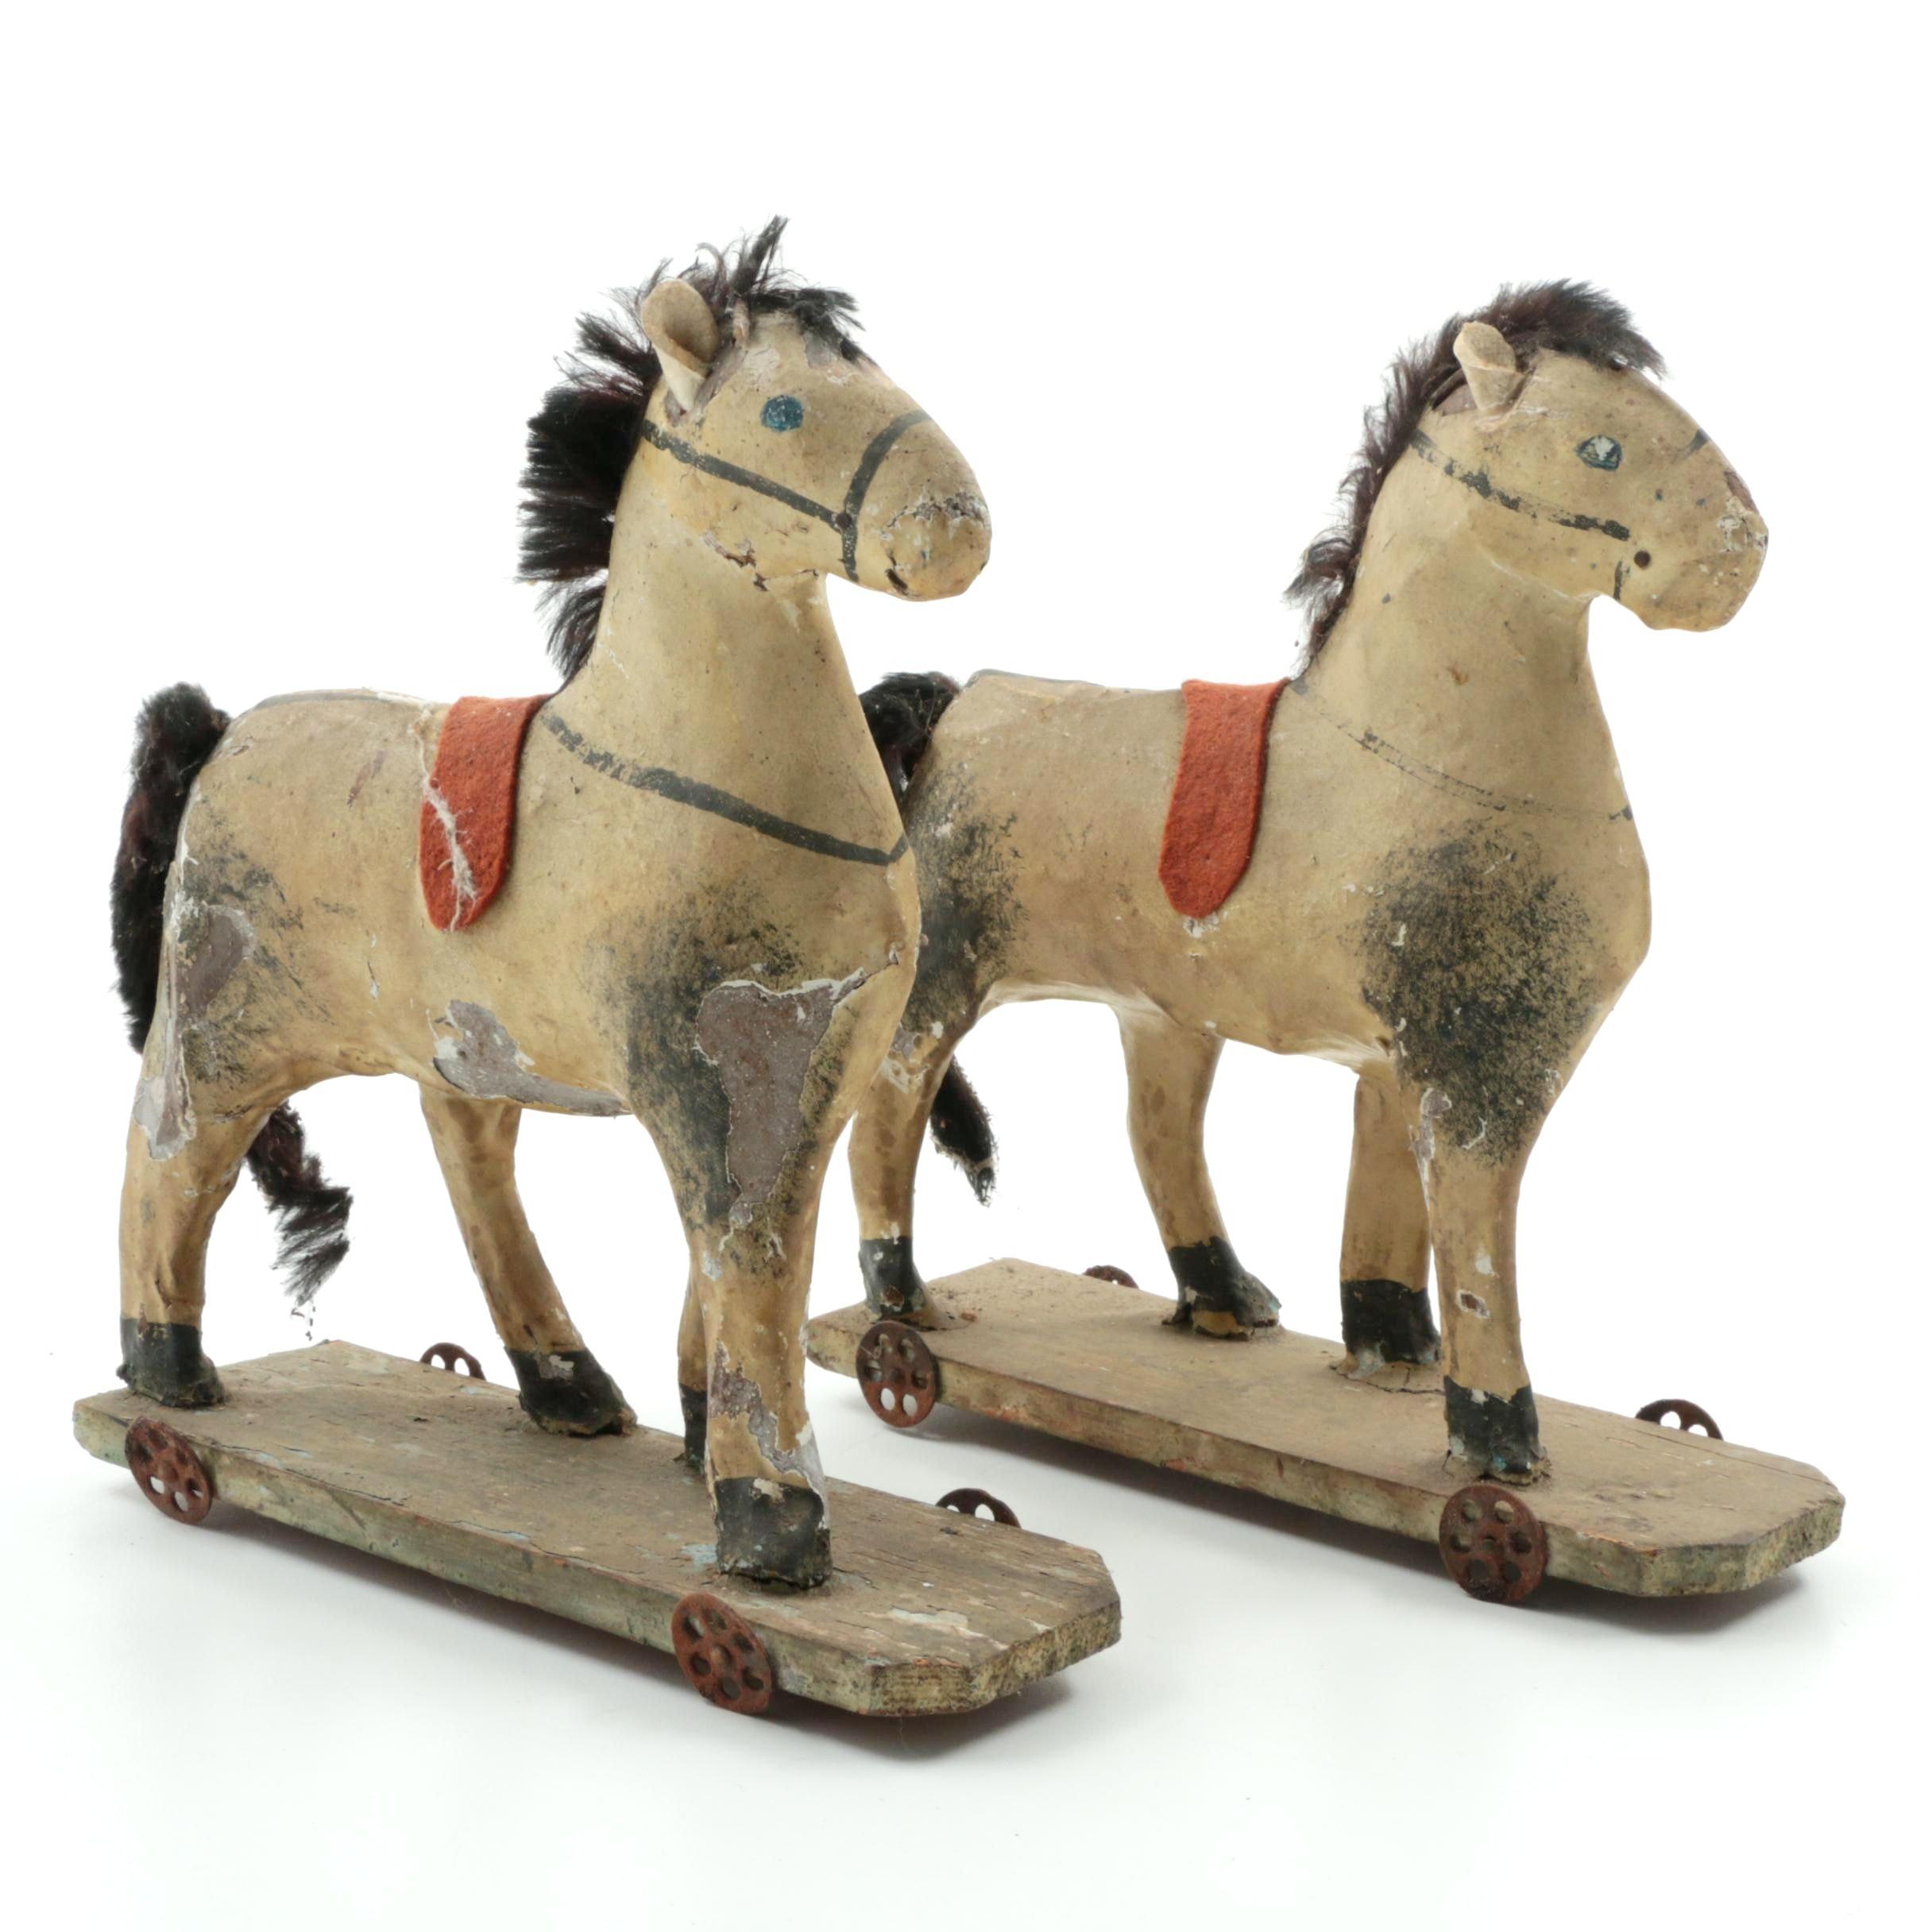 Two Antique Pony Toys